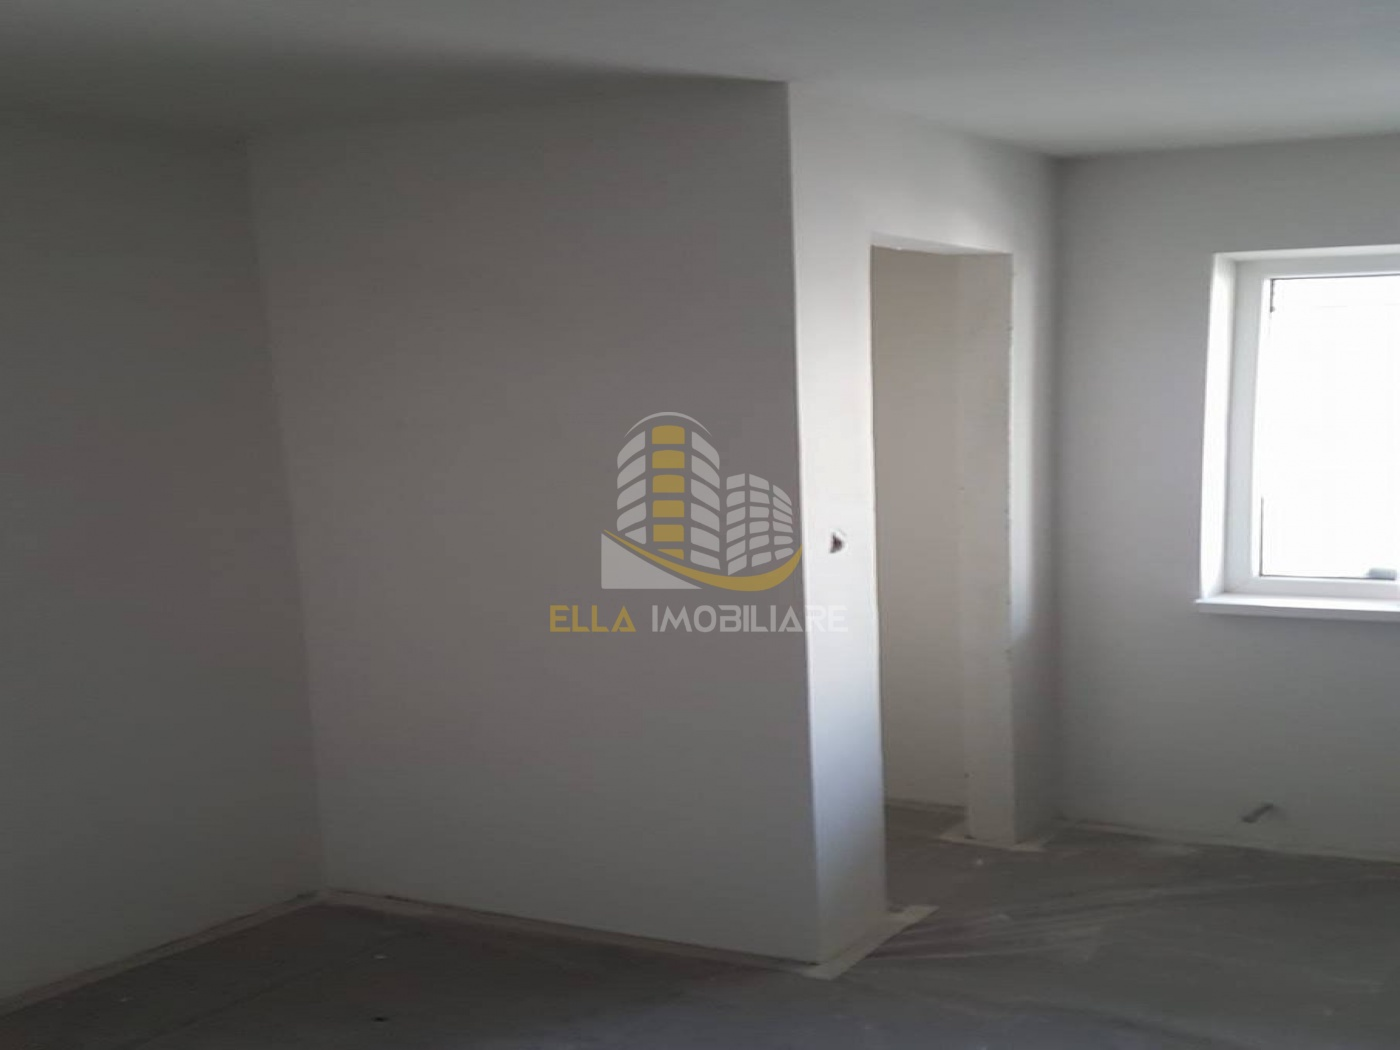 Zona Prieteniei, Botosani, Botosani, Romania, 2 Bedrooms Bedrooms, 2 Rooms Rooms,1 BathroomBathrooms,Apartament 2 camere,De vanzare,3,2521